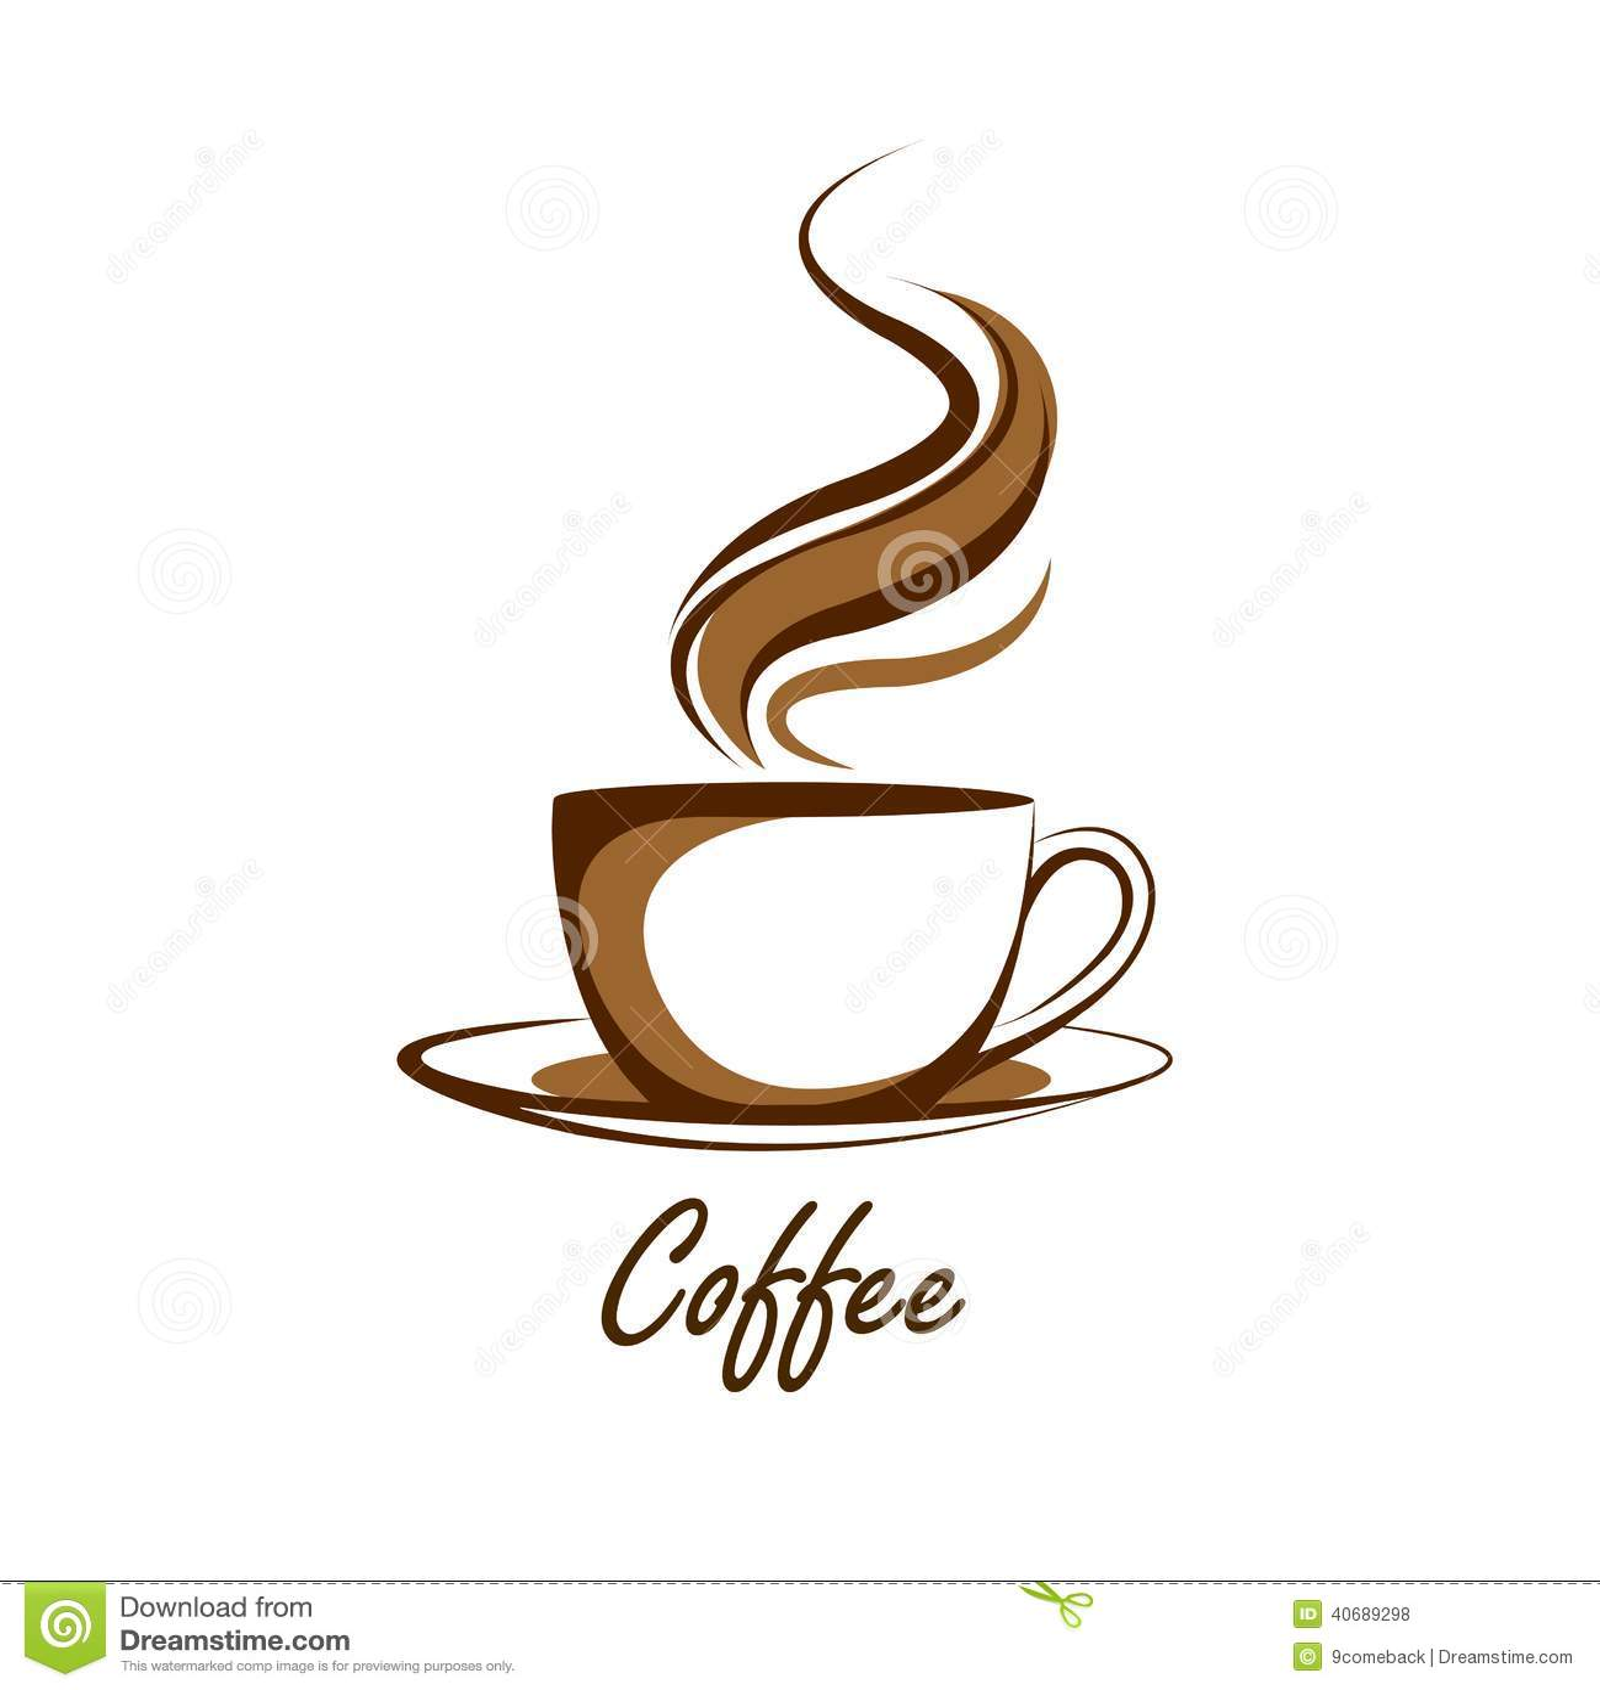 Coffee Cup Vector Stock Vector - Image: 40689298